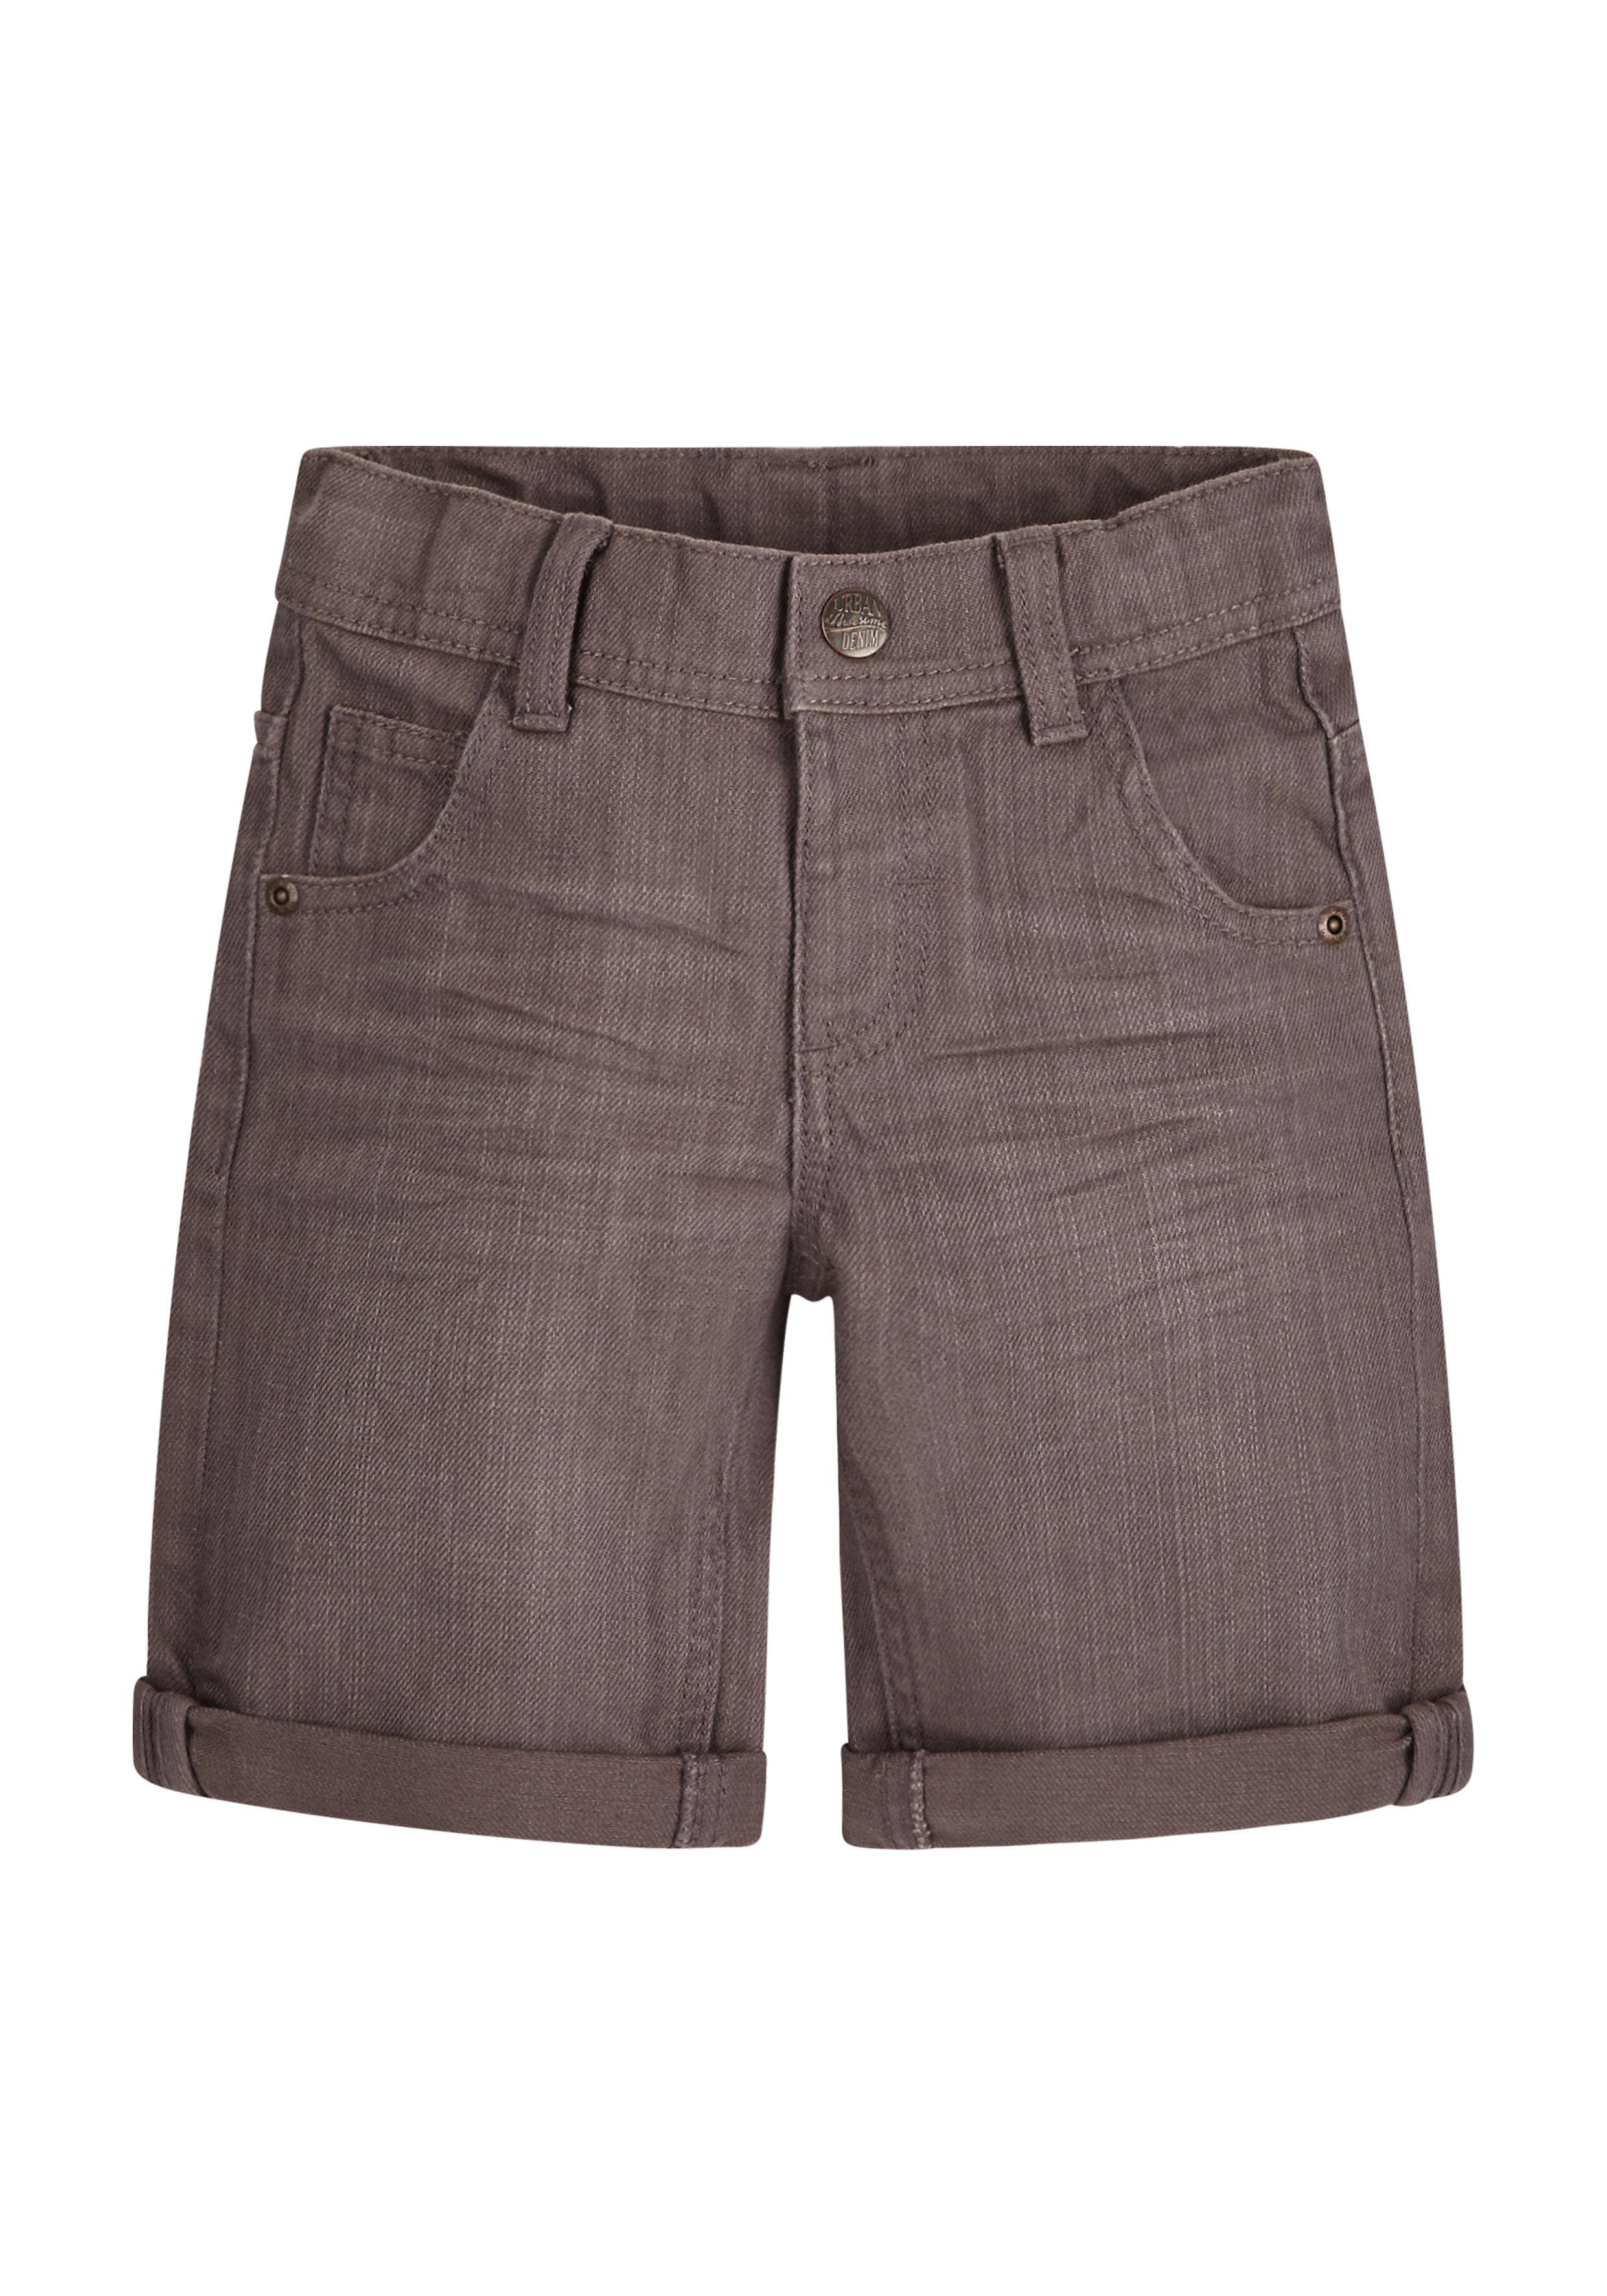 Mothercare | Boys Denim Shorts - Grey